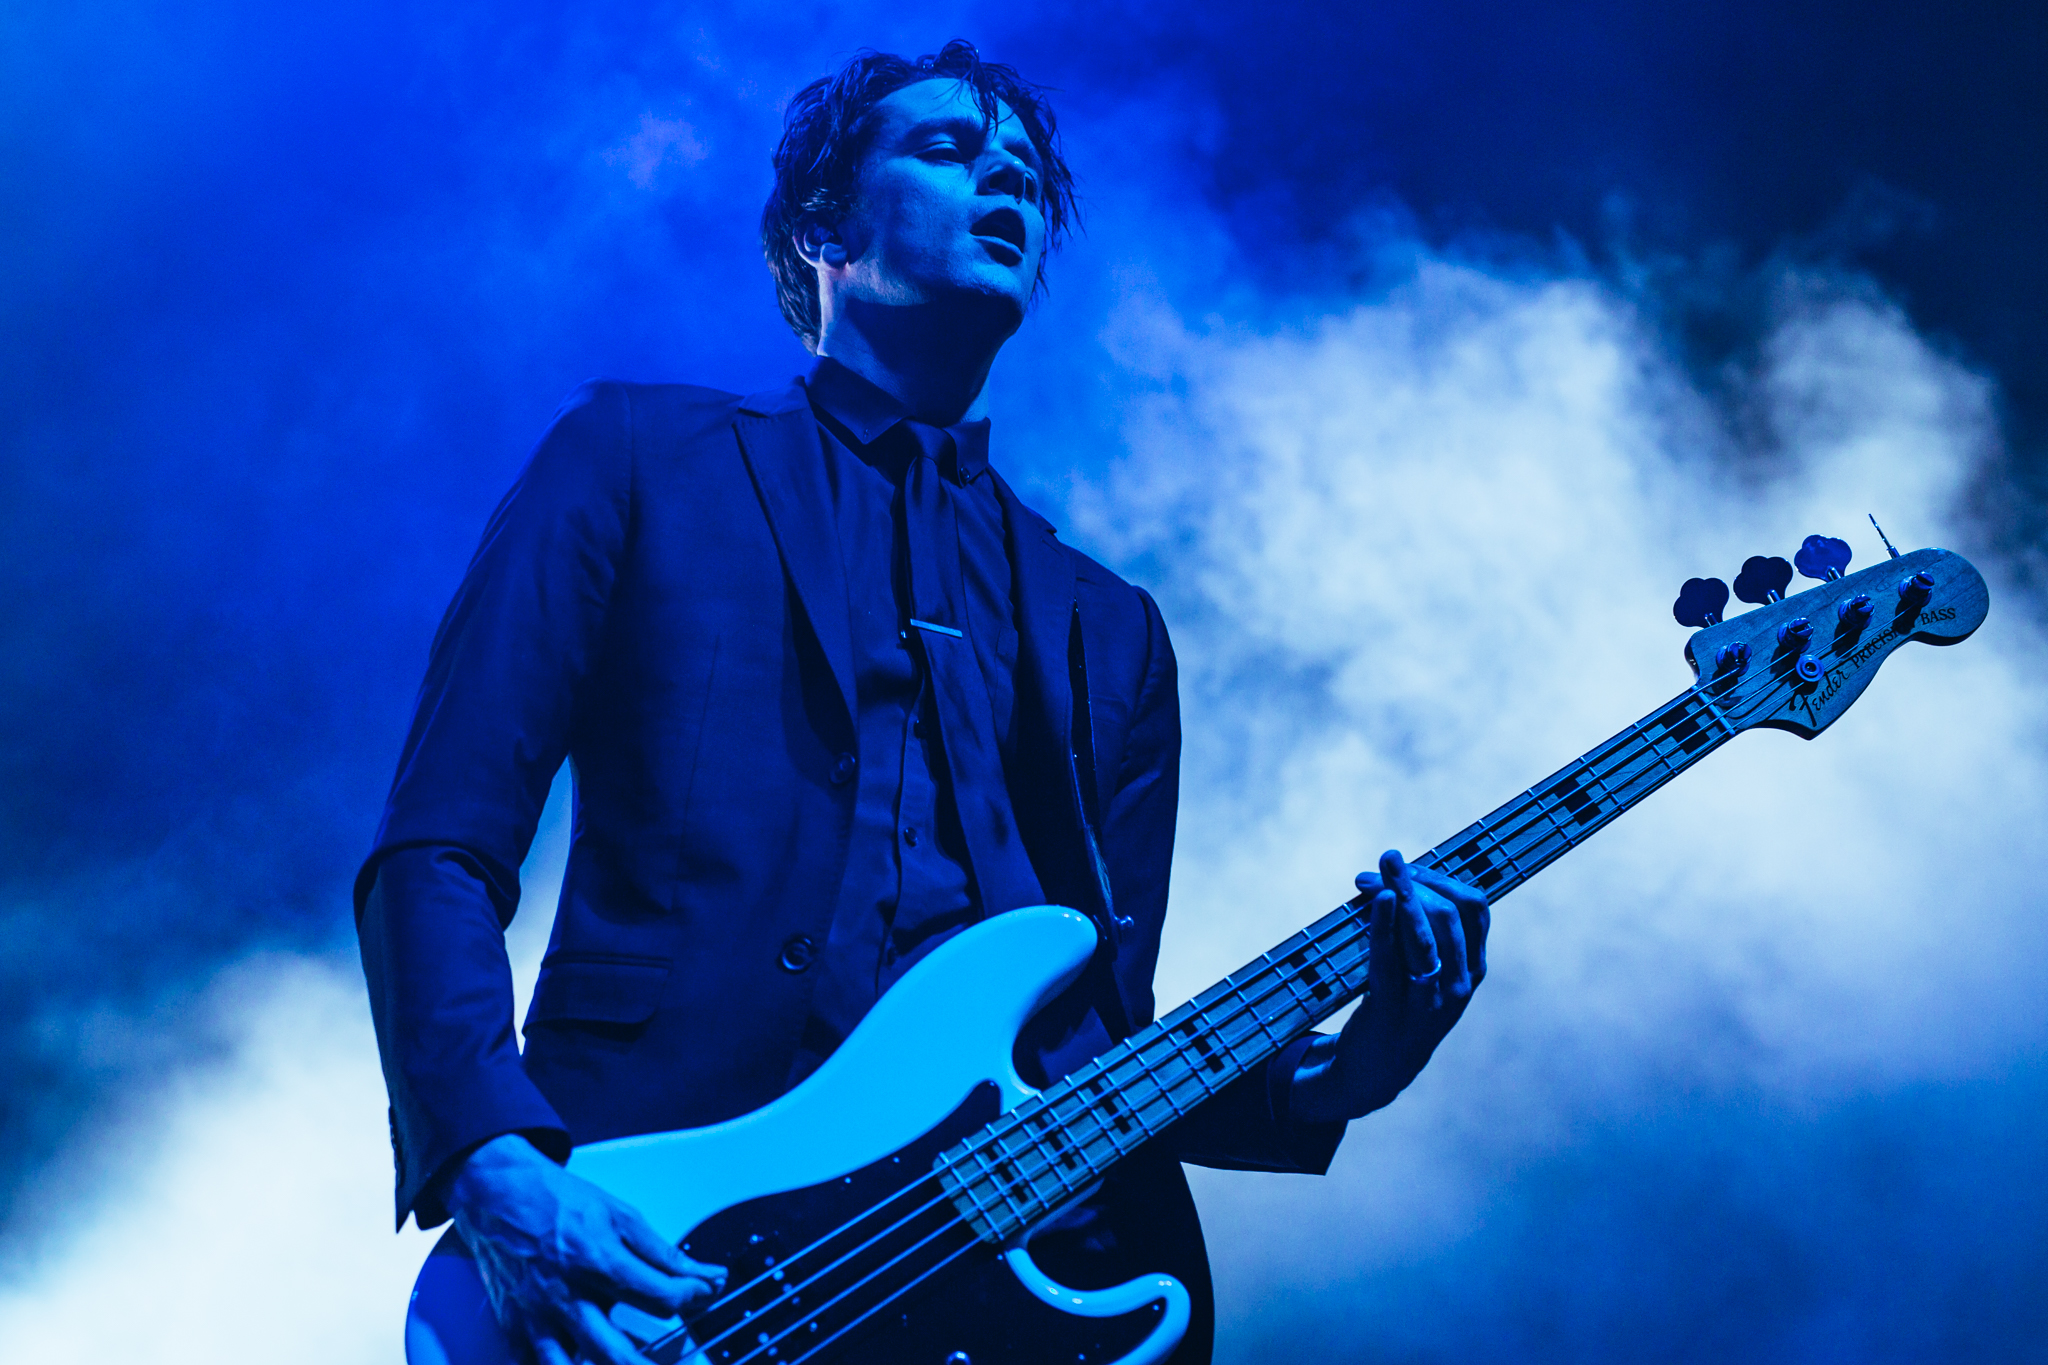 Mitch Lowe Photo - Panic At The Disco - Riverstage-34.jpg